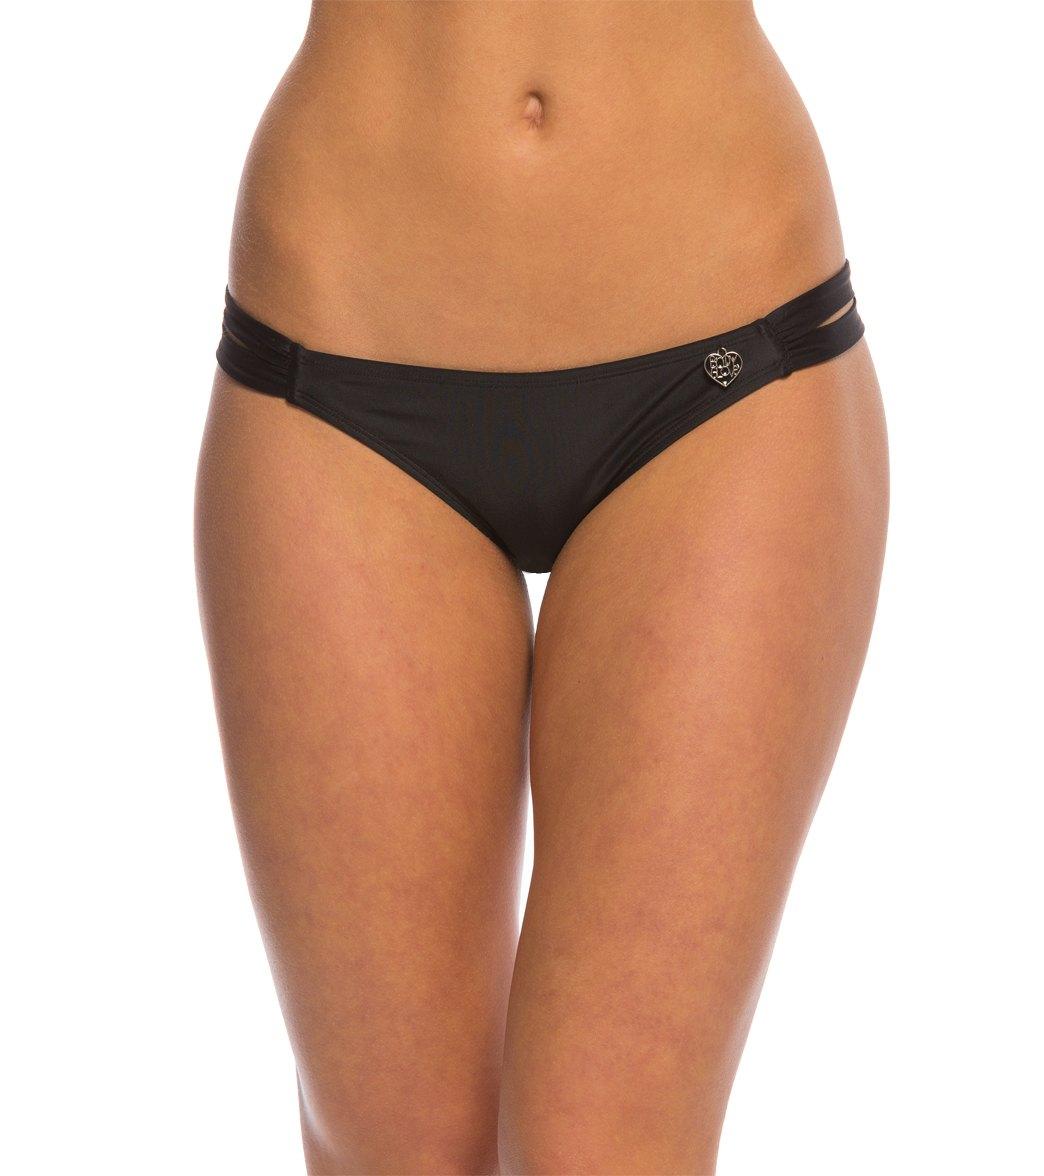 7783f33e0f Body Glove Swimwear Smoothies Bali Bikini Bottom at SwimOutlet.com